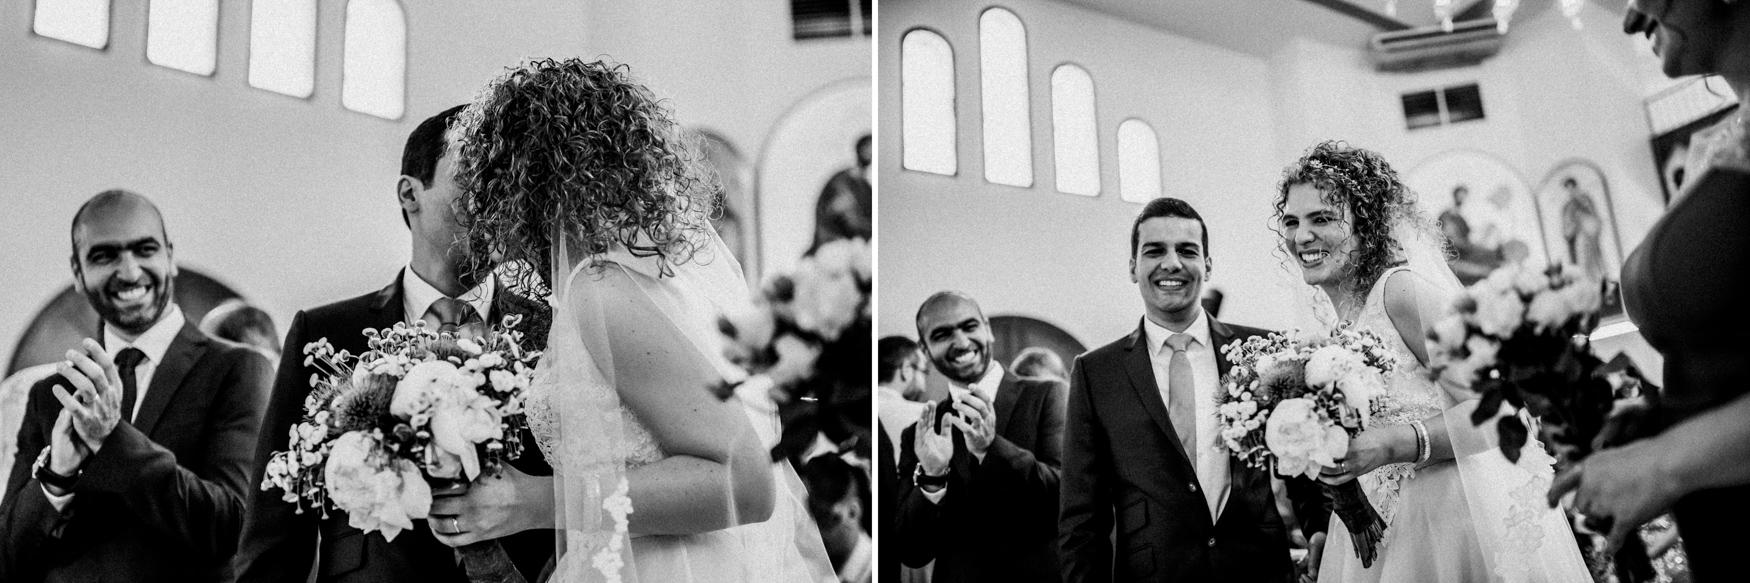 LR3 byblos beirut church wedding ceremony lebanon 014.jpg